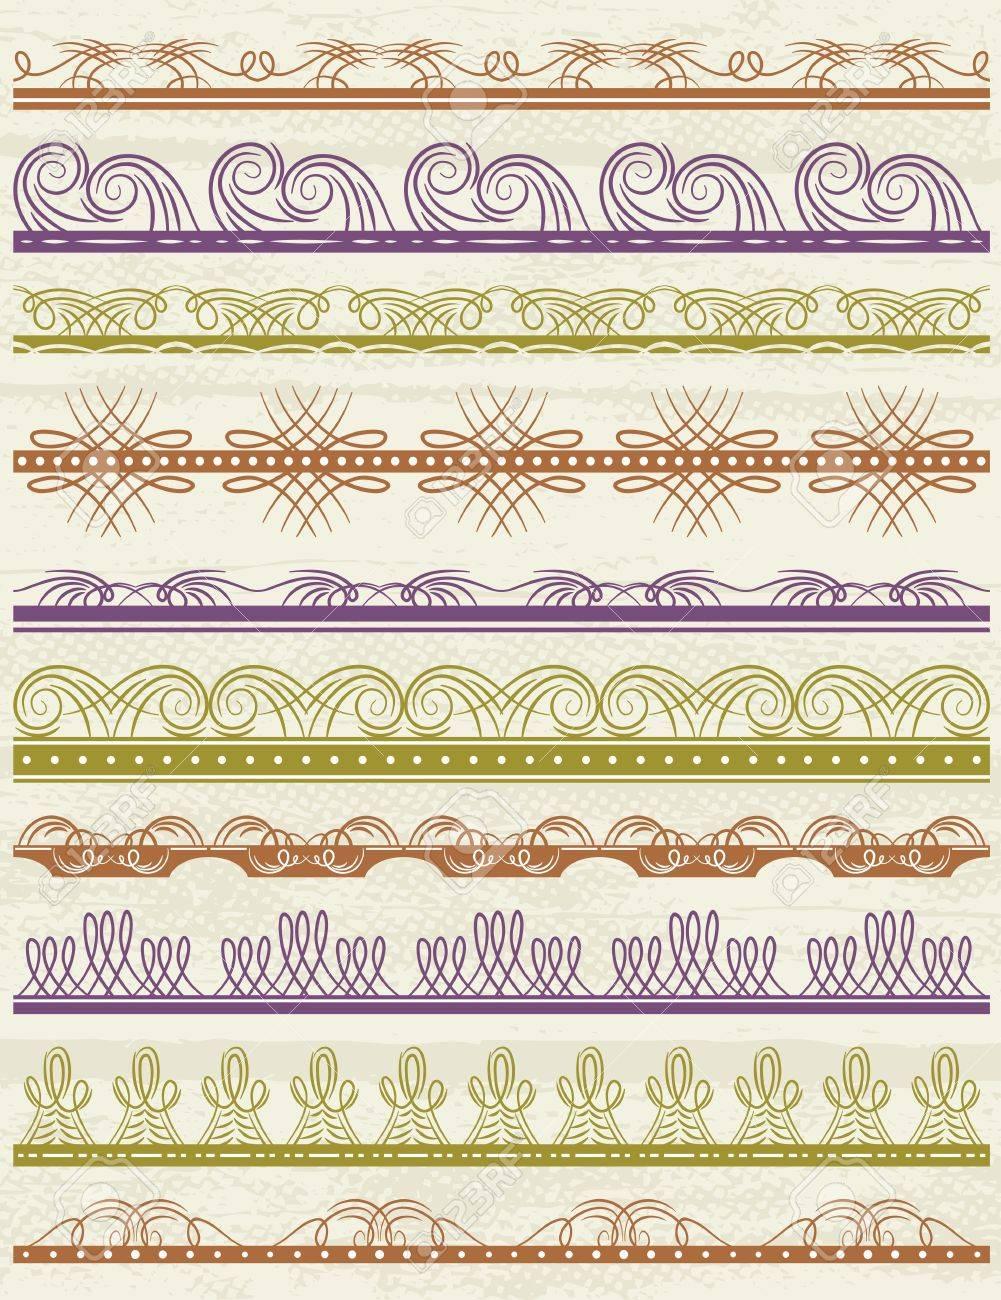 floral decorative borders, ornamental rules, dividers, vector Stock Vector - 18958983